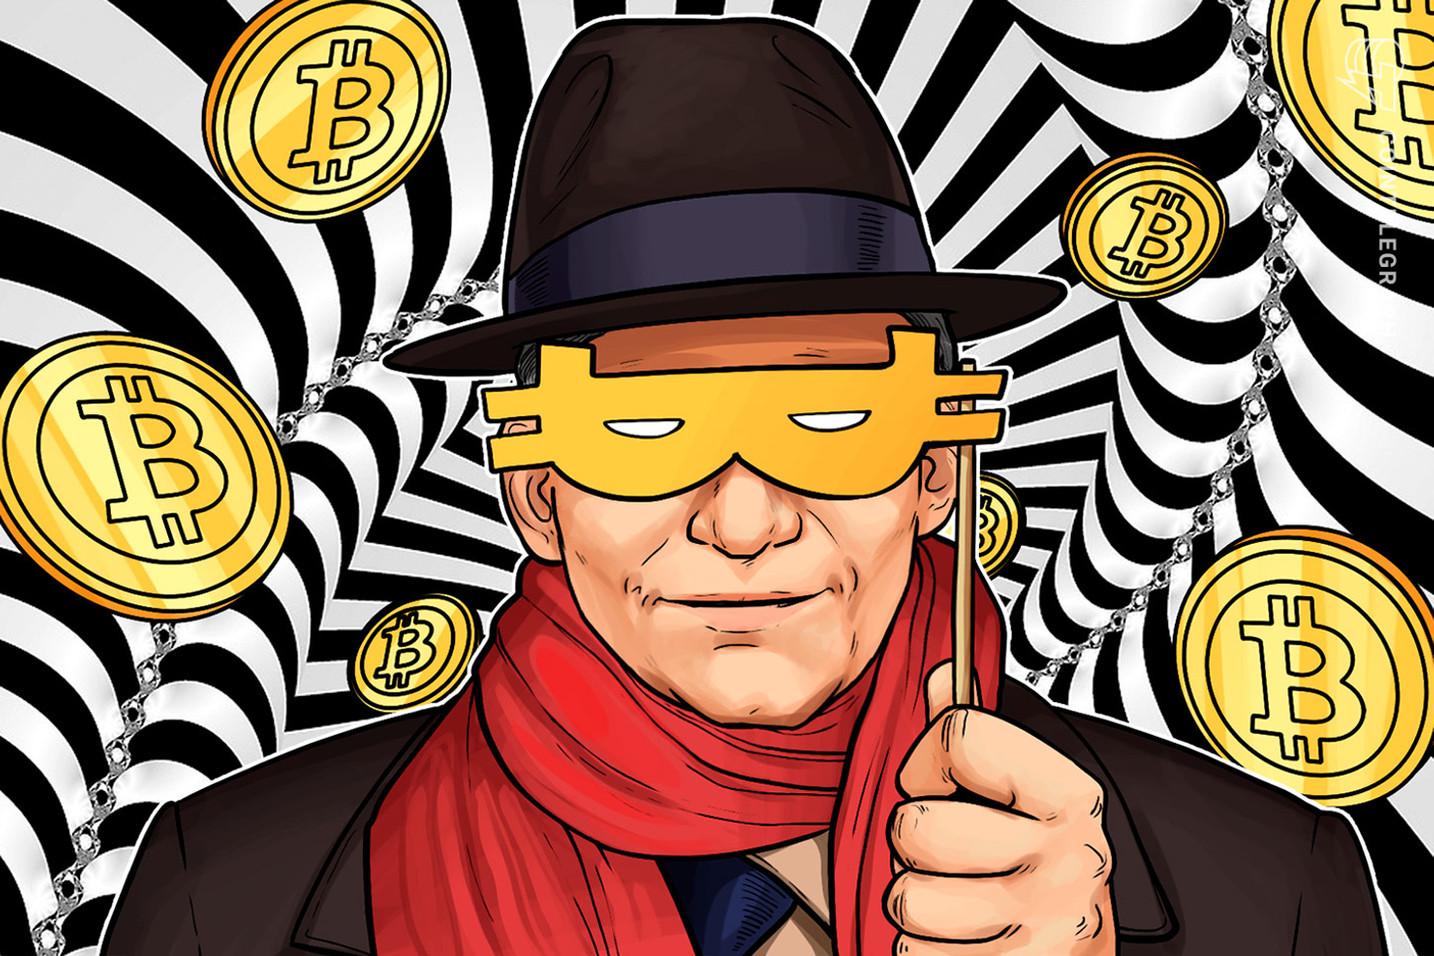 """SatoXi Nakamoto""  ビットコイン急騰とアメリカが仮想通貨業界から見放された日"